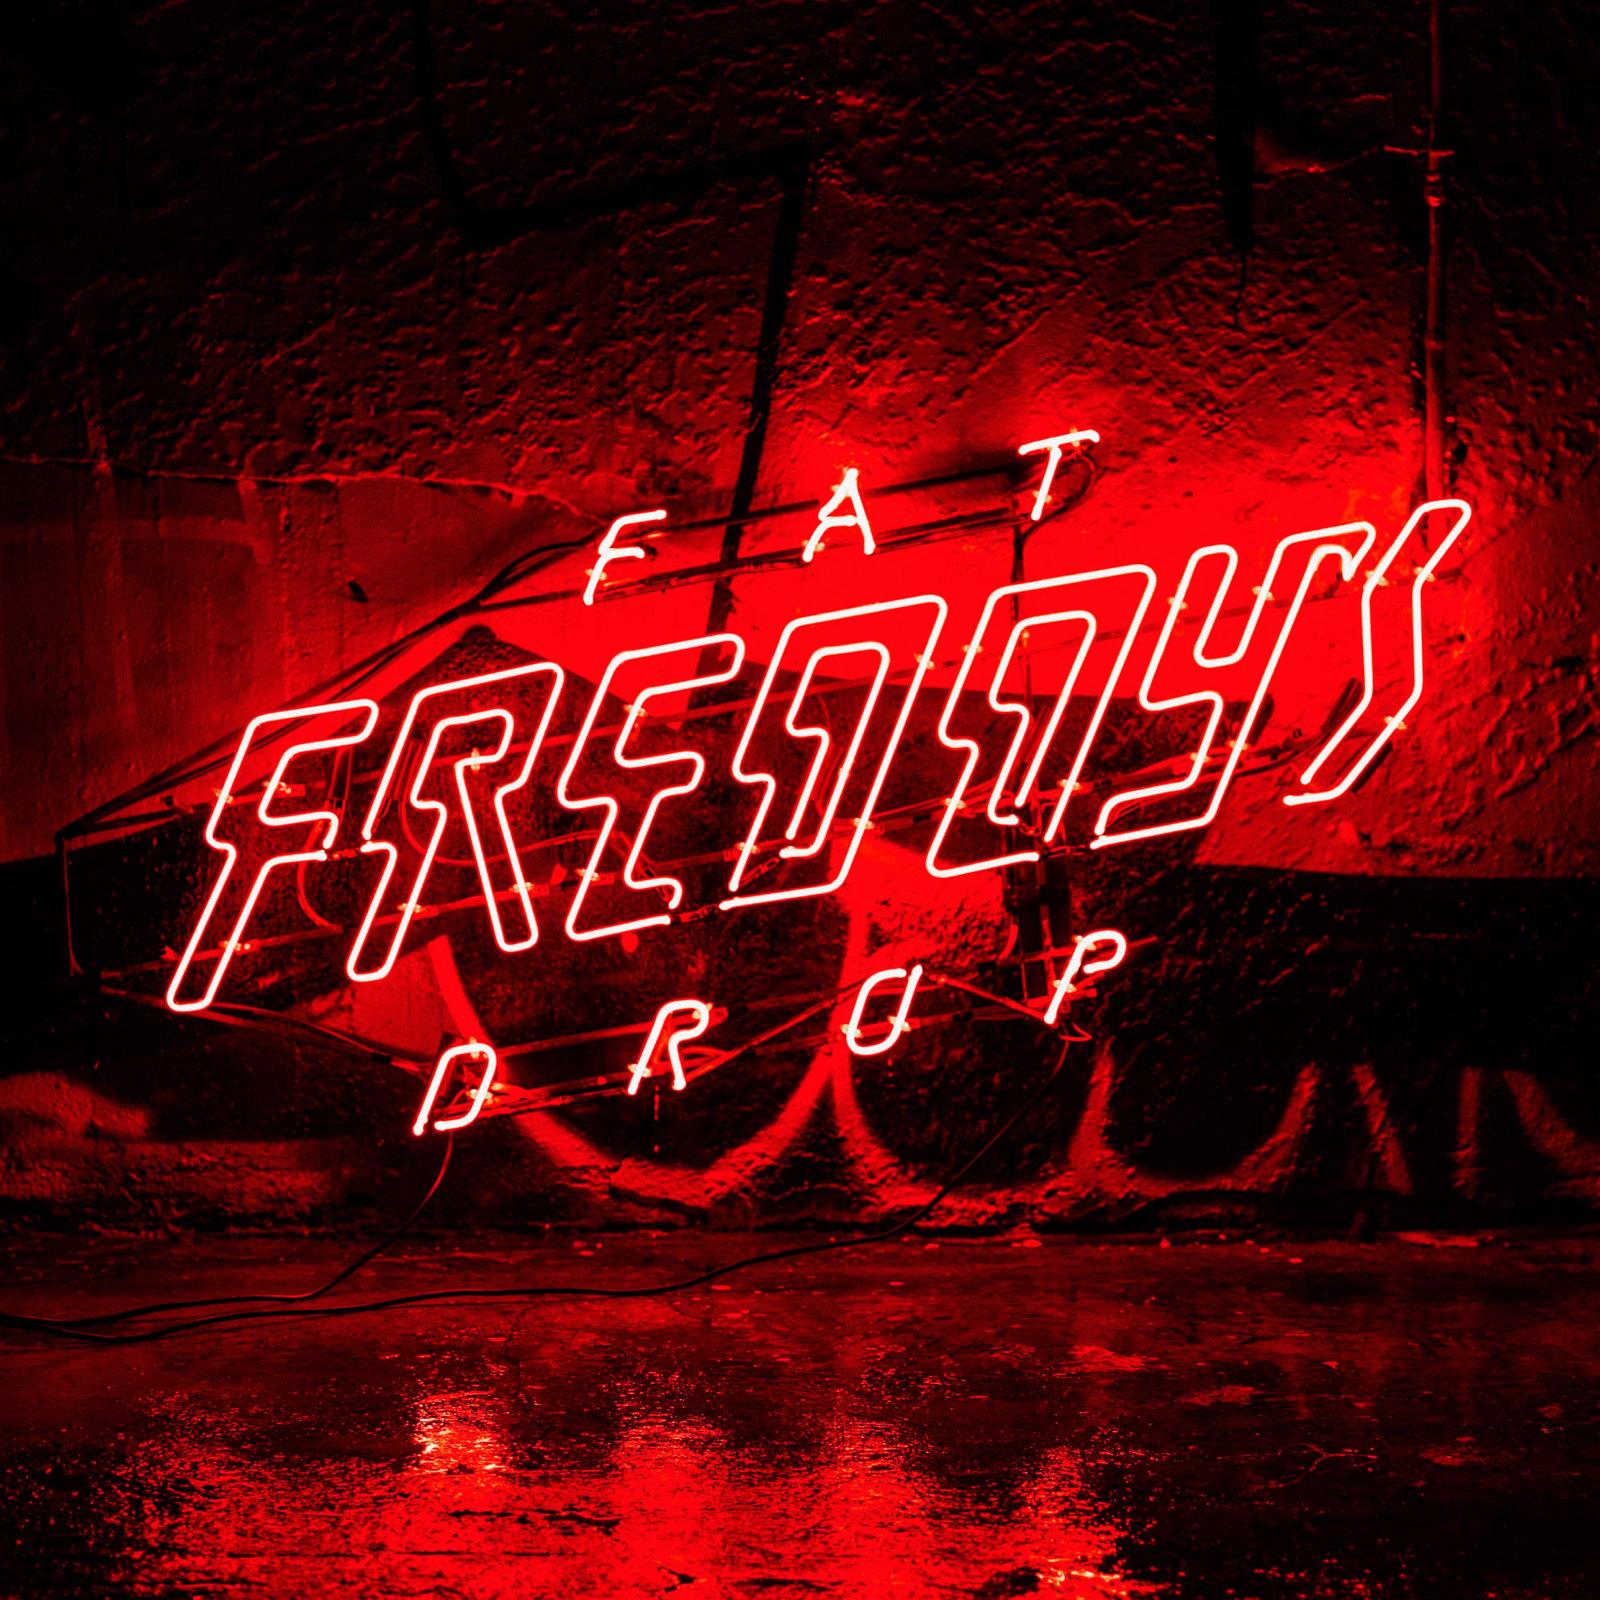 Bays by Fat Freddy's Drop image